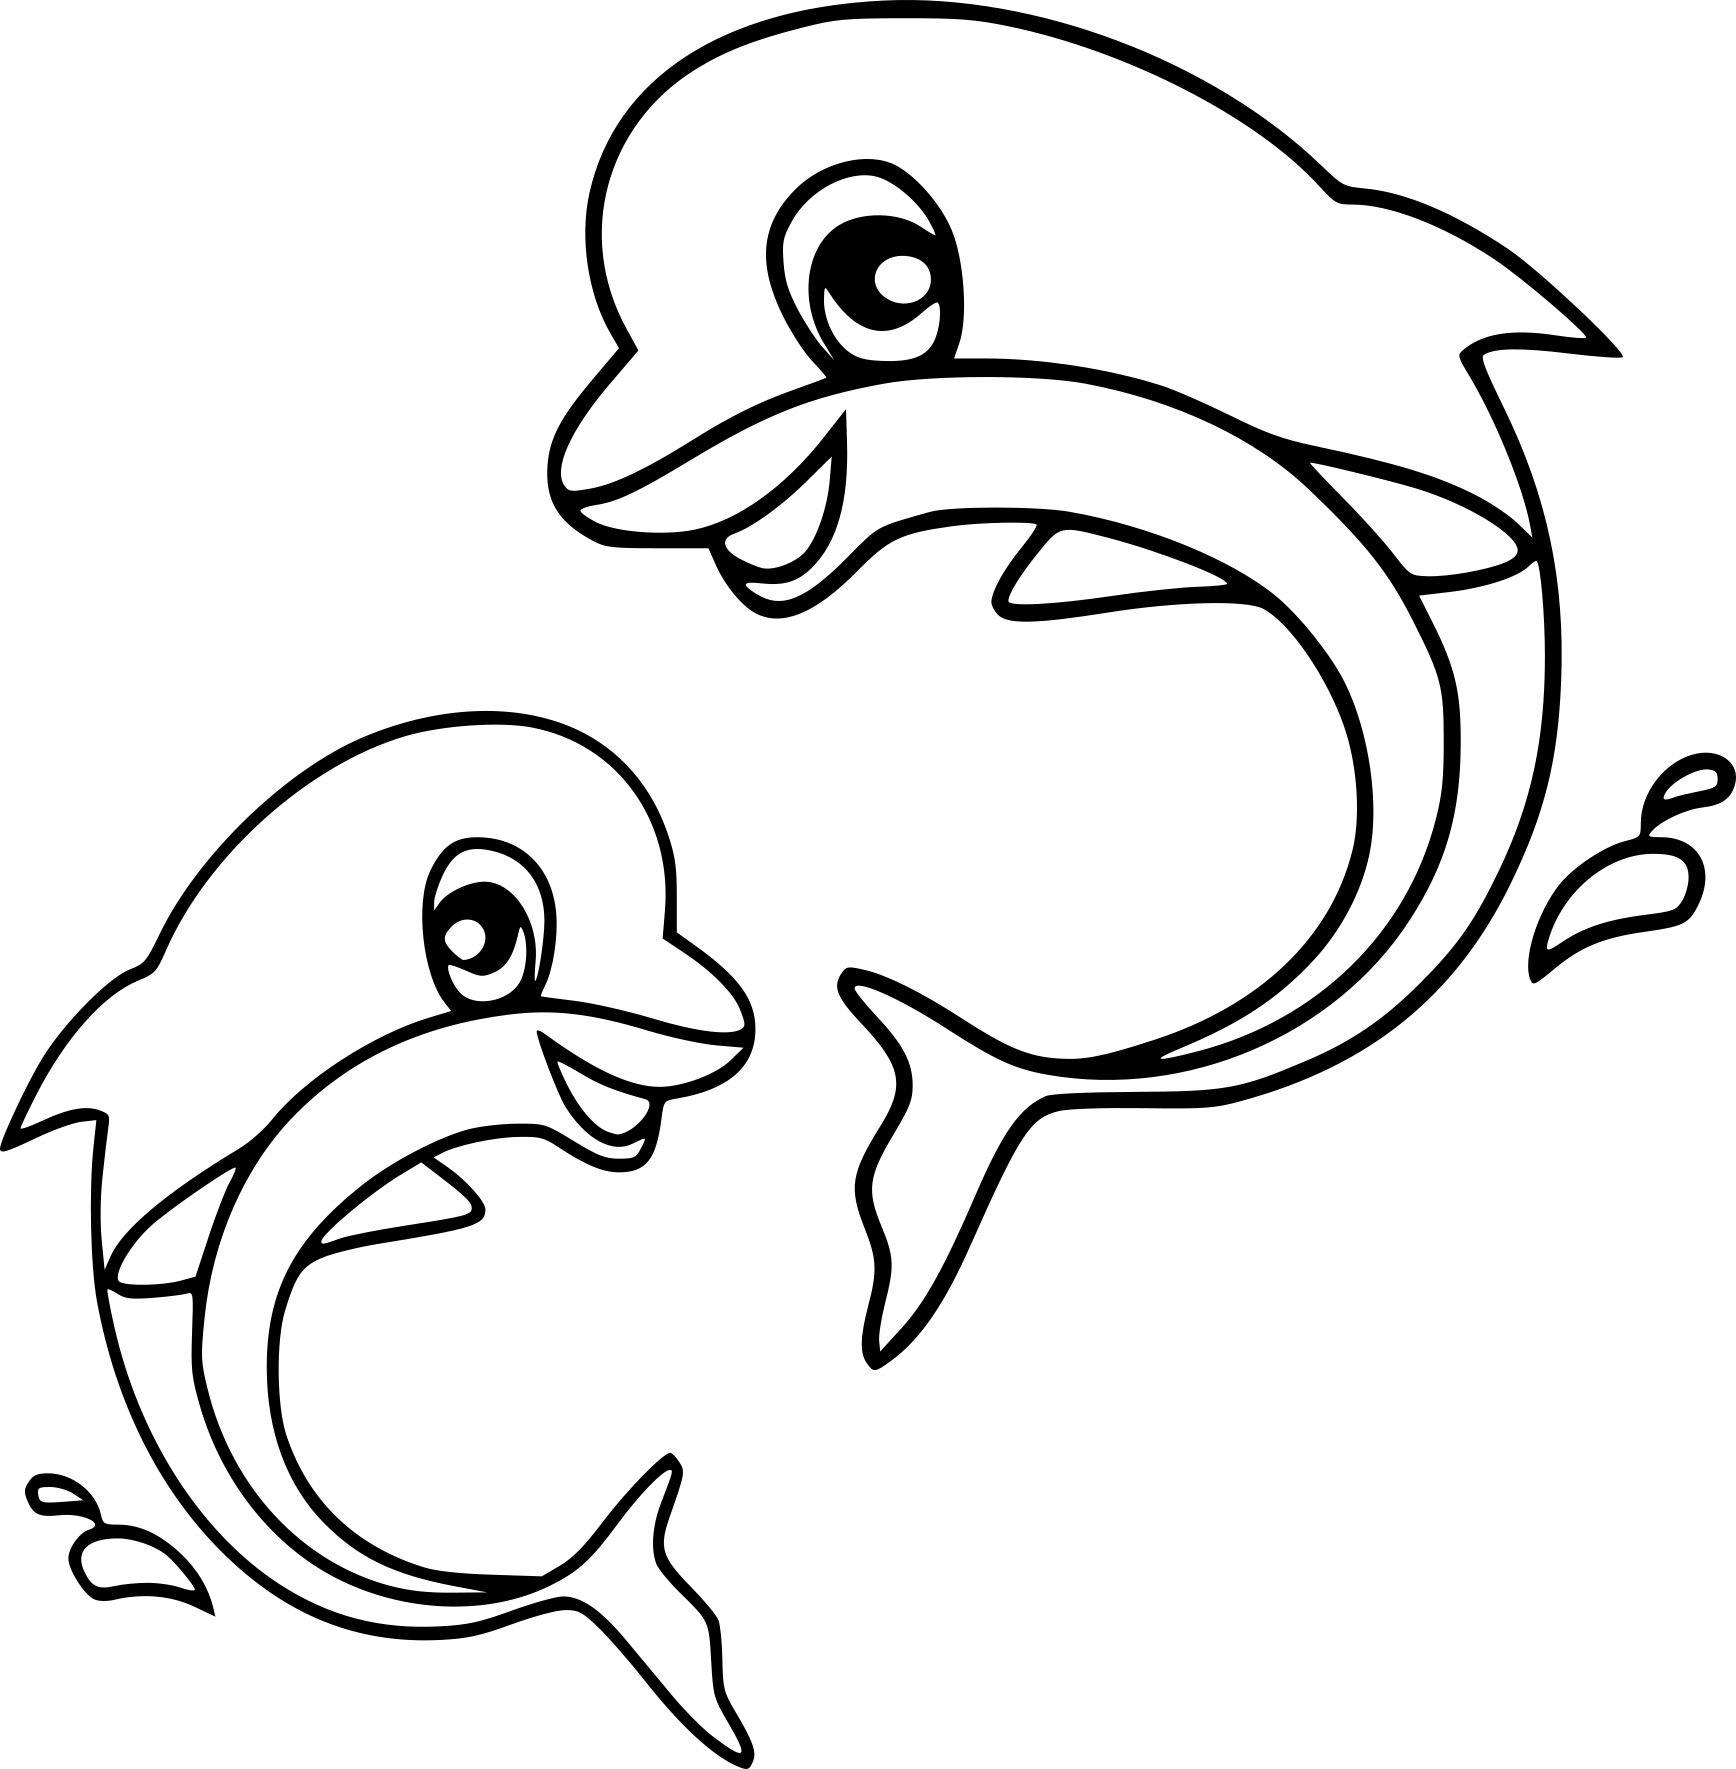 Dauphins d 39 amour de leylana2 page 3 - Images dauphins a imprimer ...